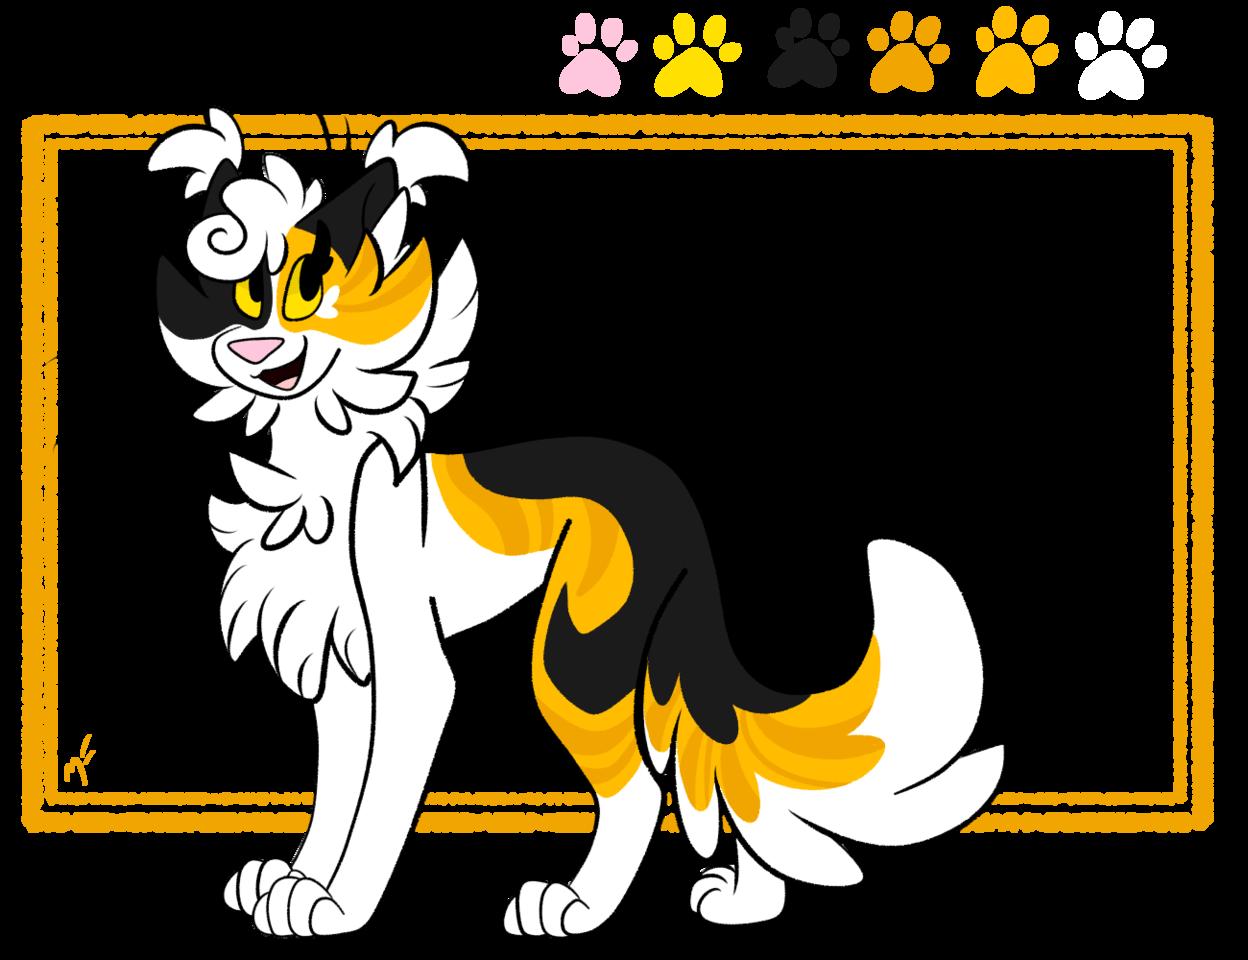 Illust of ✧ Midnight ✧ oc cat referencesheet redraw medibangpaint redesign